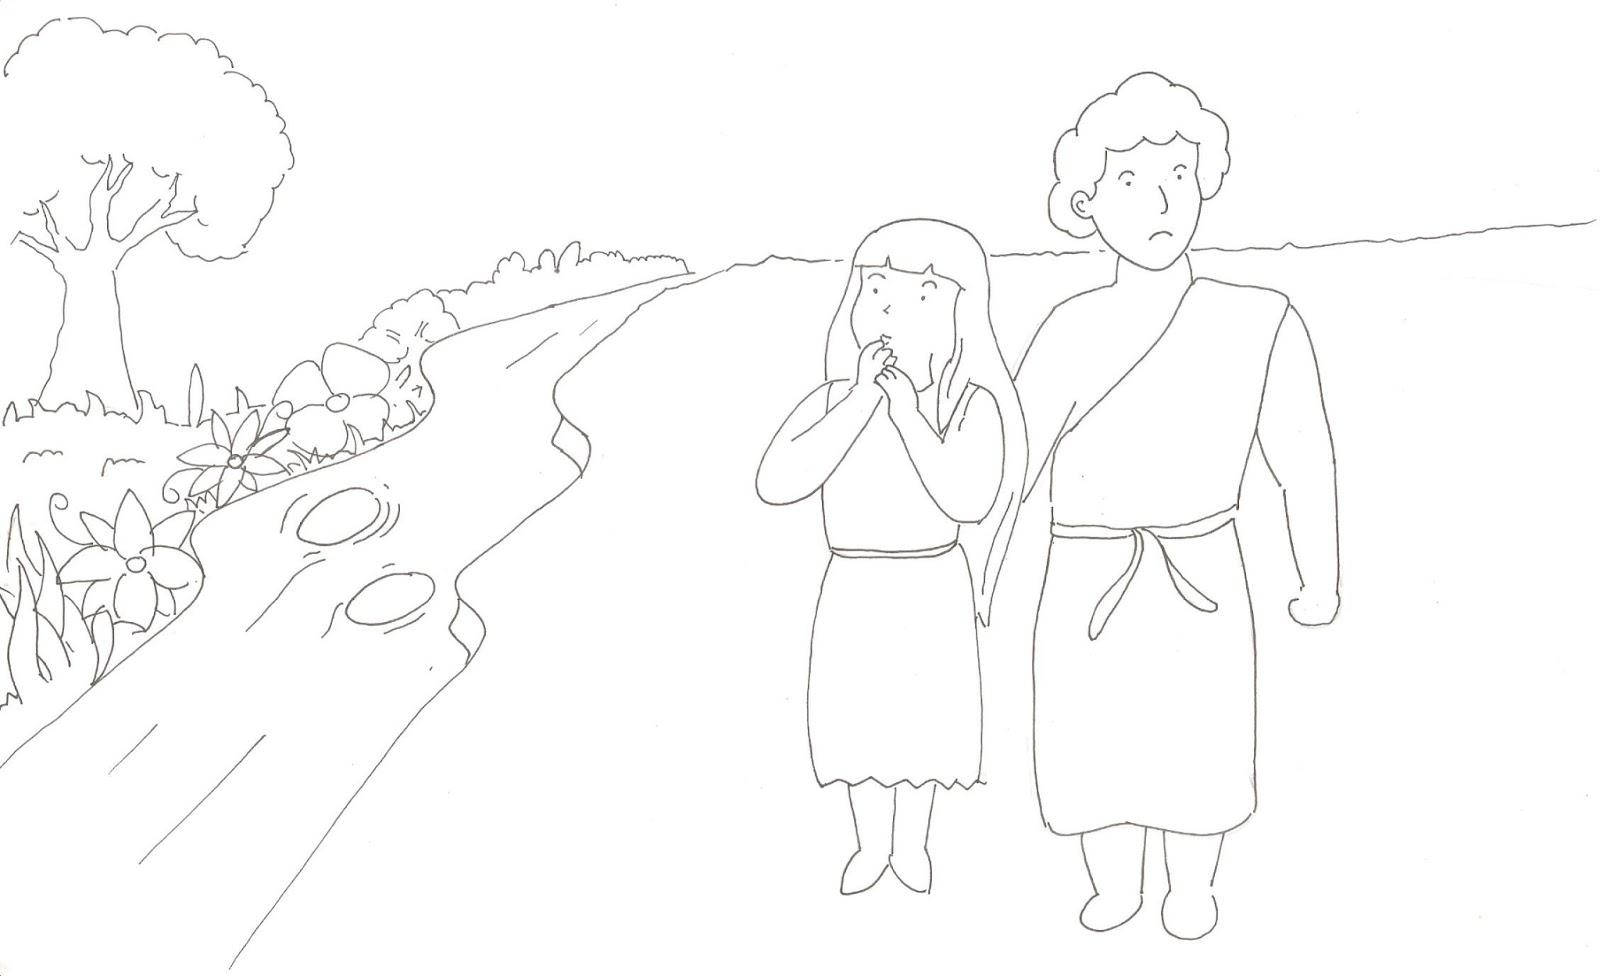 Dan TUHAN Allah membuat pakaian dari kulit binatang untuk manusia dan untuk isterinya itu lalu mengenakannya kepada mereka